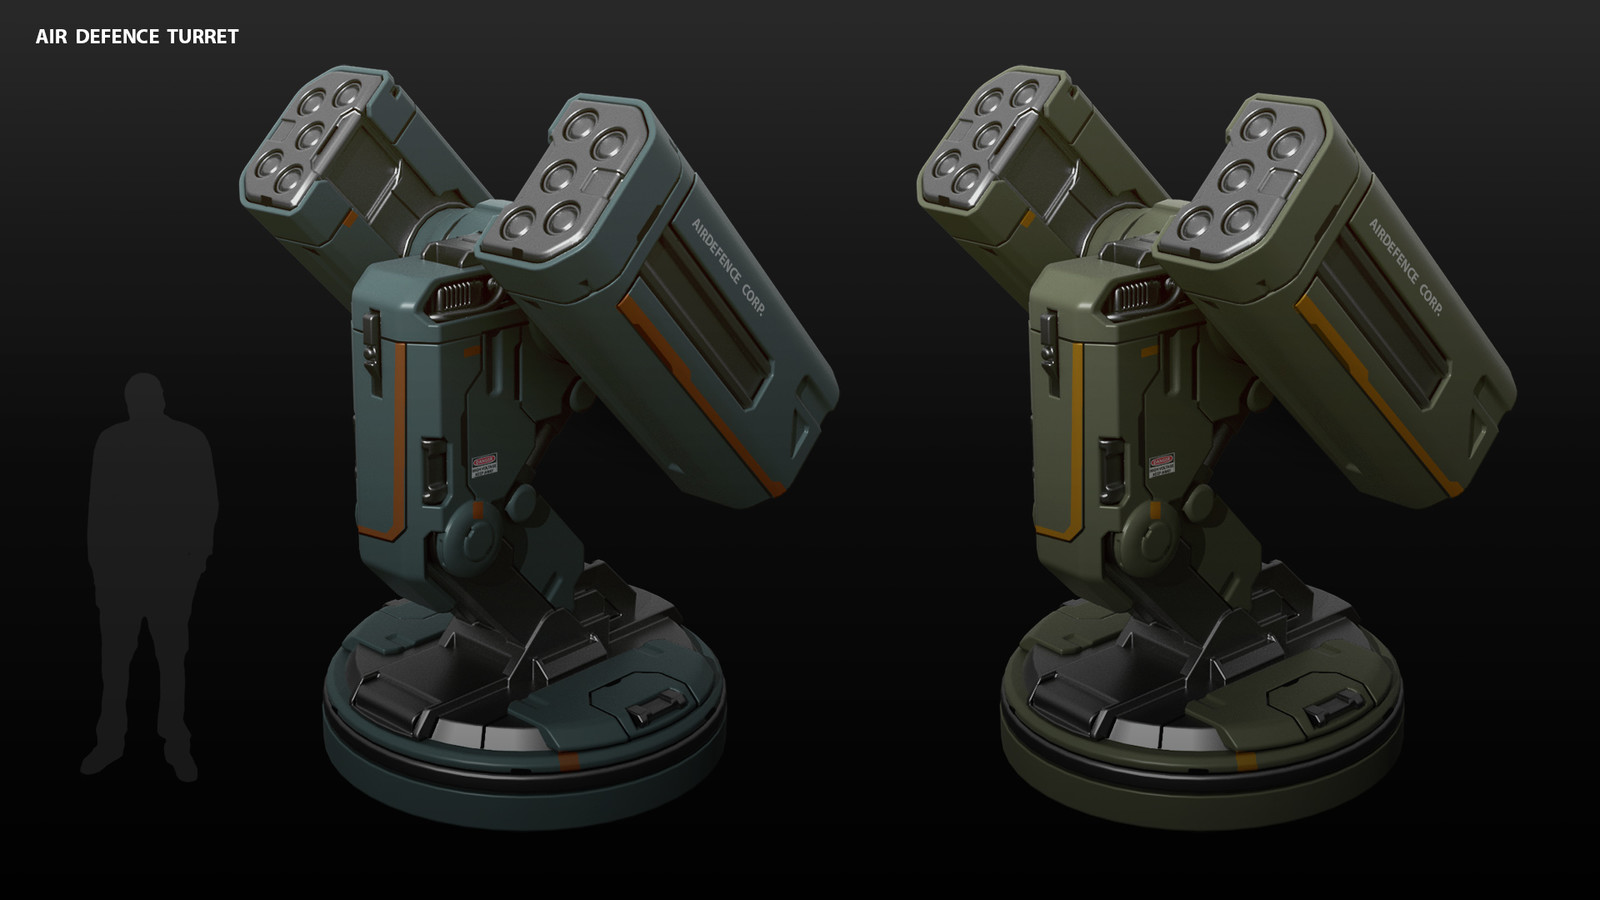 Stylized Sci-Fi Turret